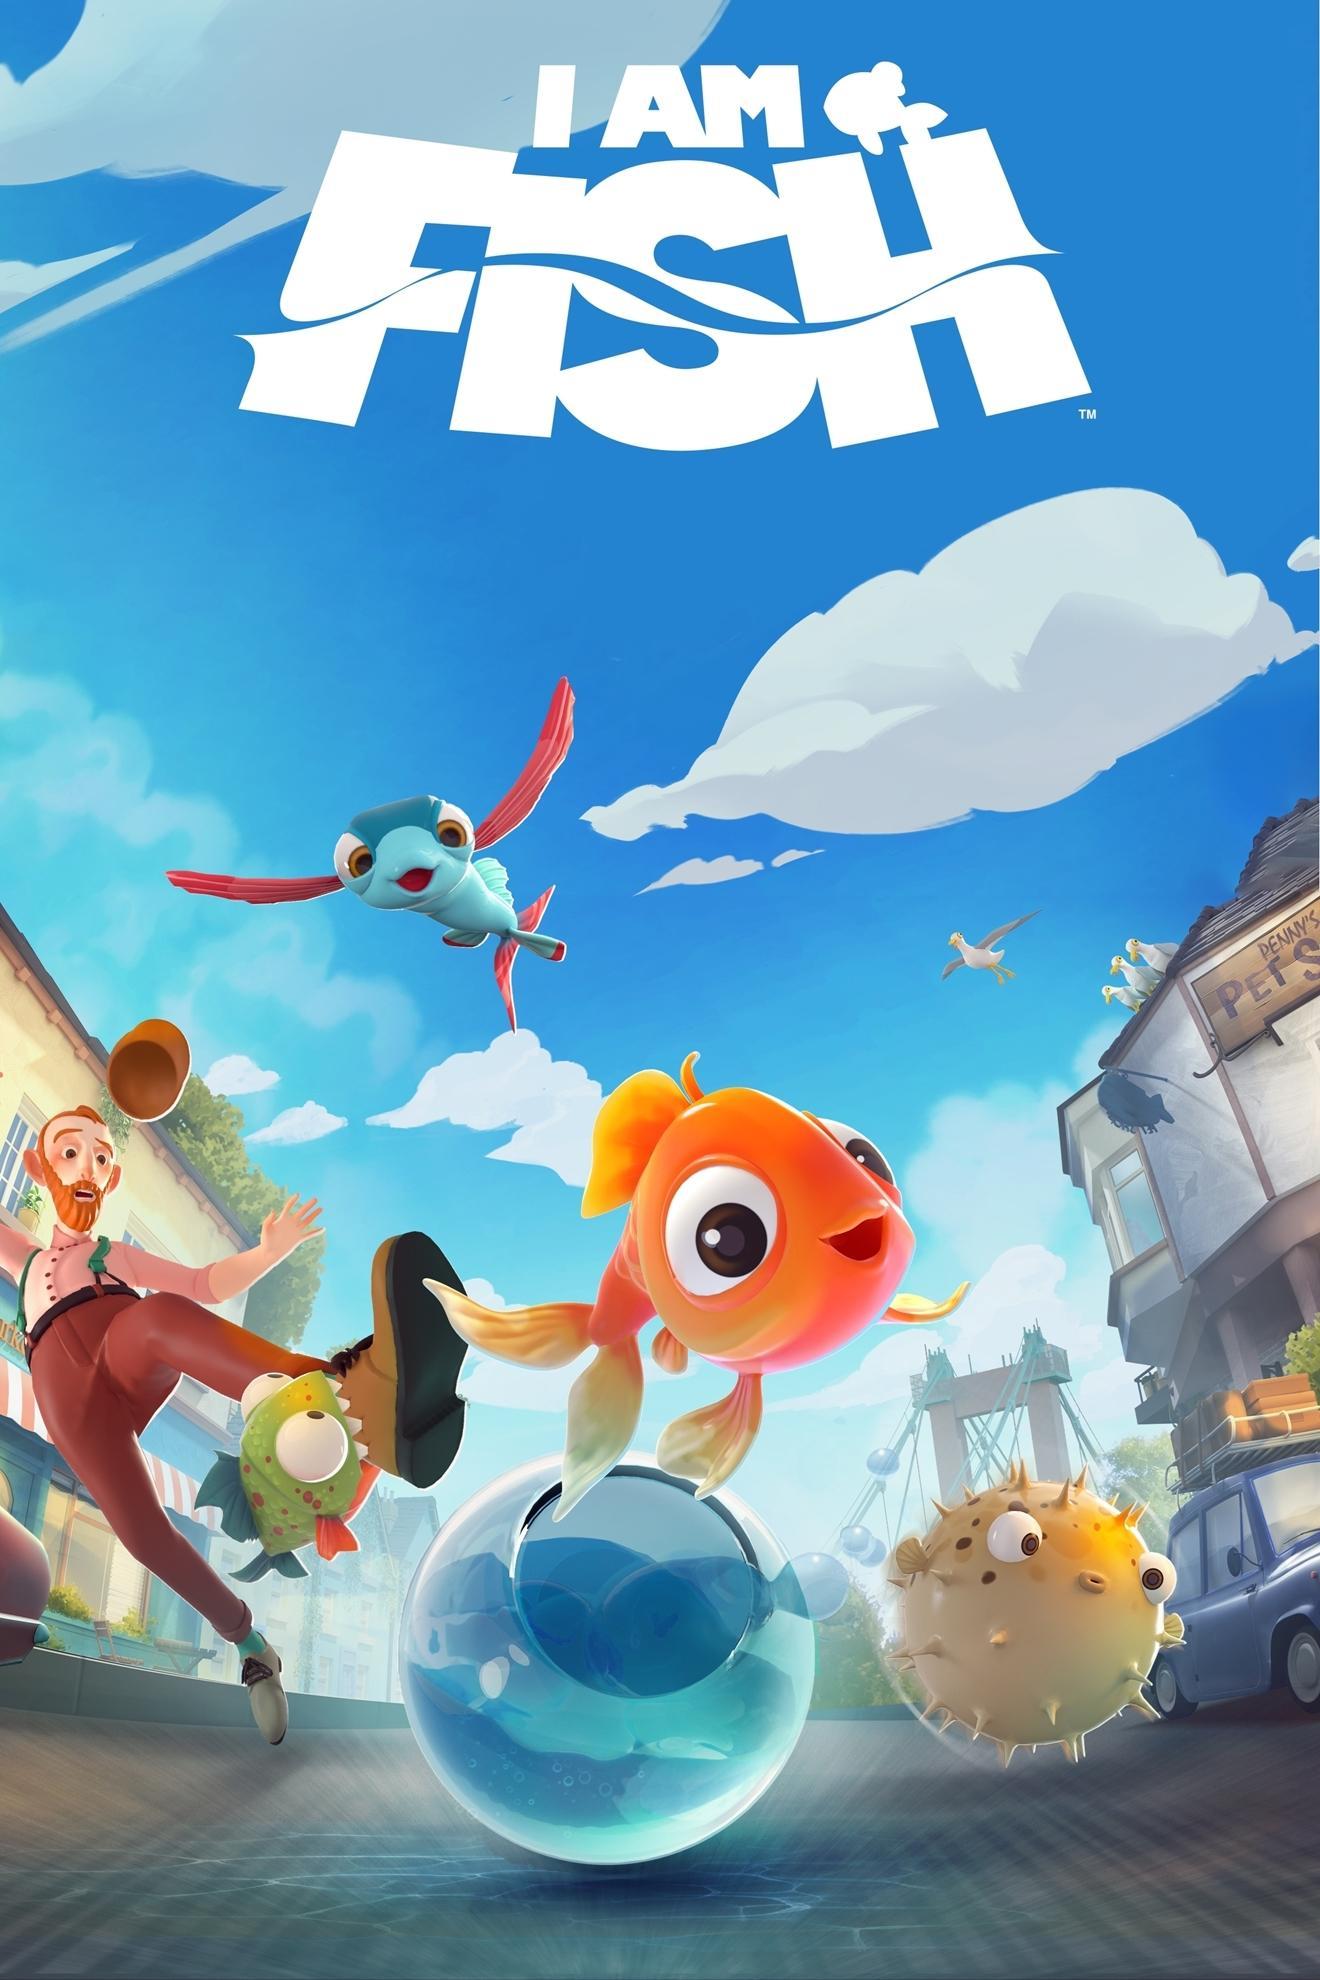 I Am Fish - Early Adopters Edition | LATAM (a4960822-52a2-4a2c-a064-5e769c37e940)